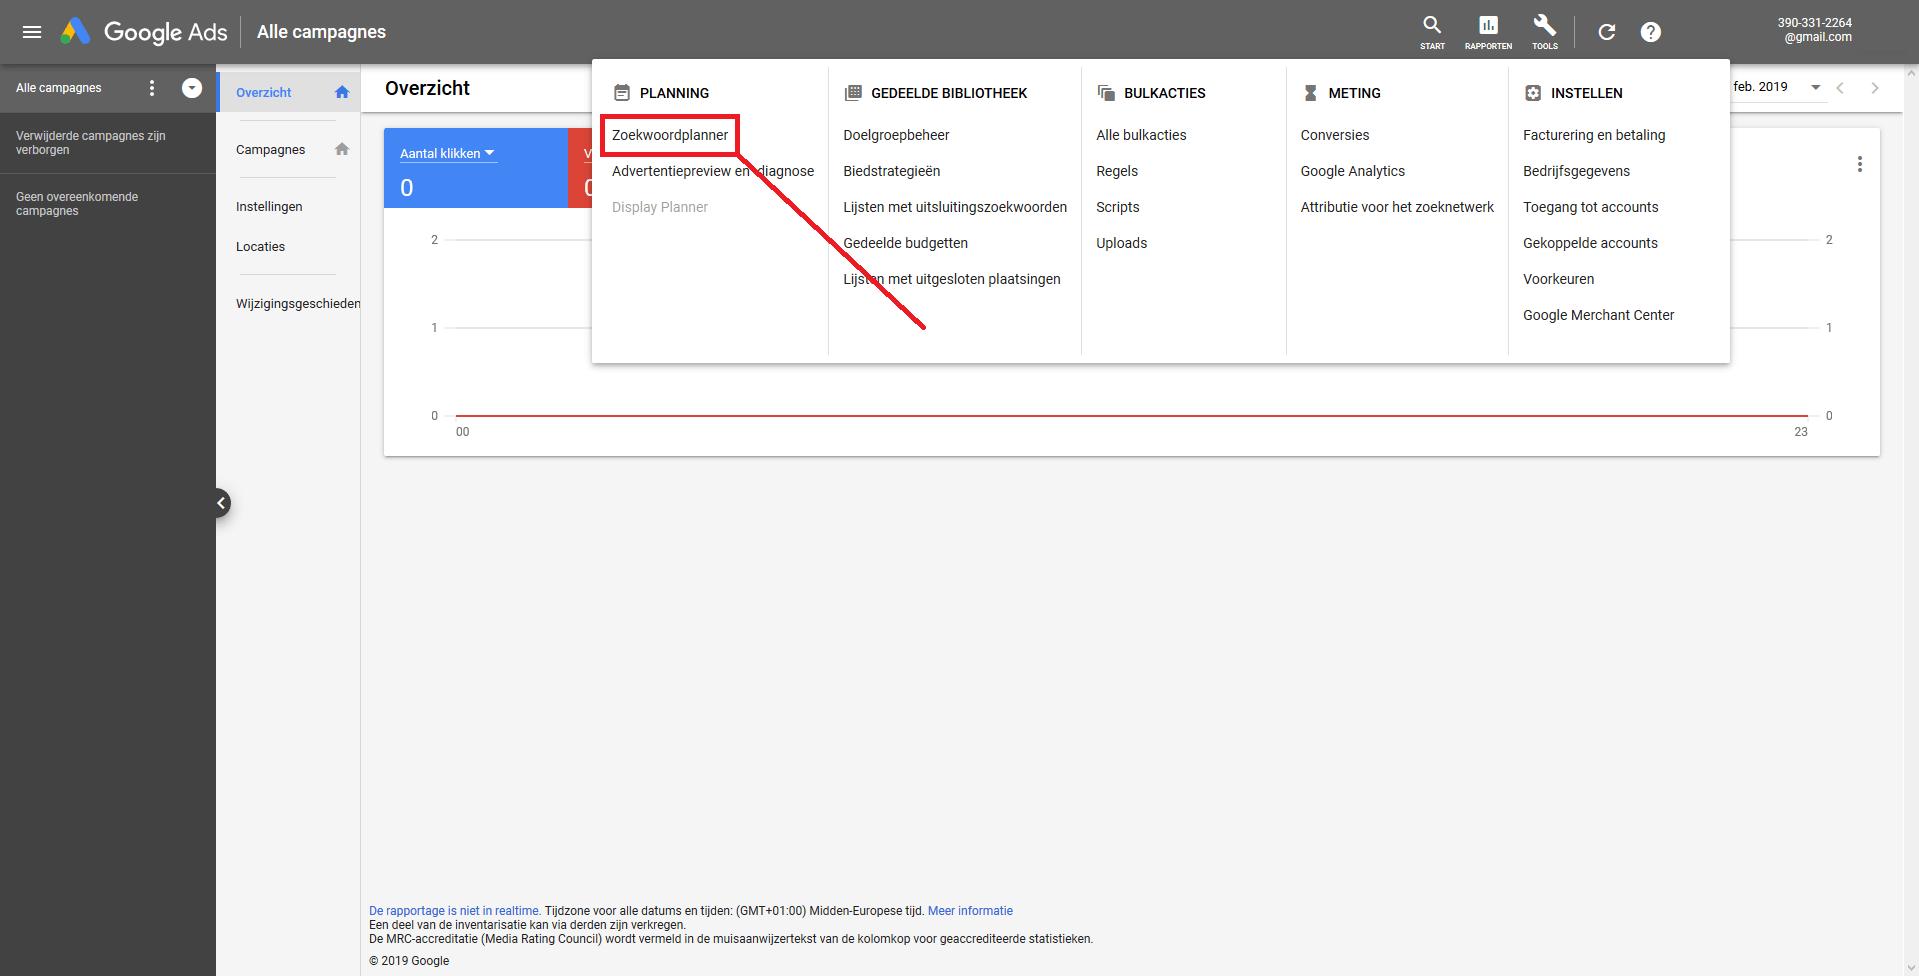 Voorbeeld Planning, Zoekwoordplanner Google Keyword Planner